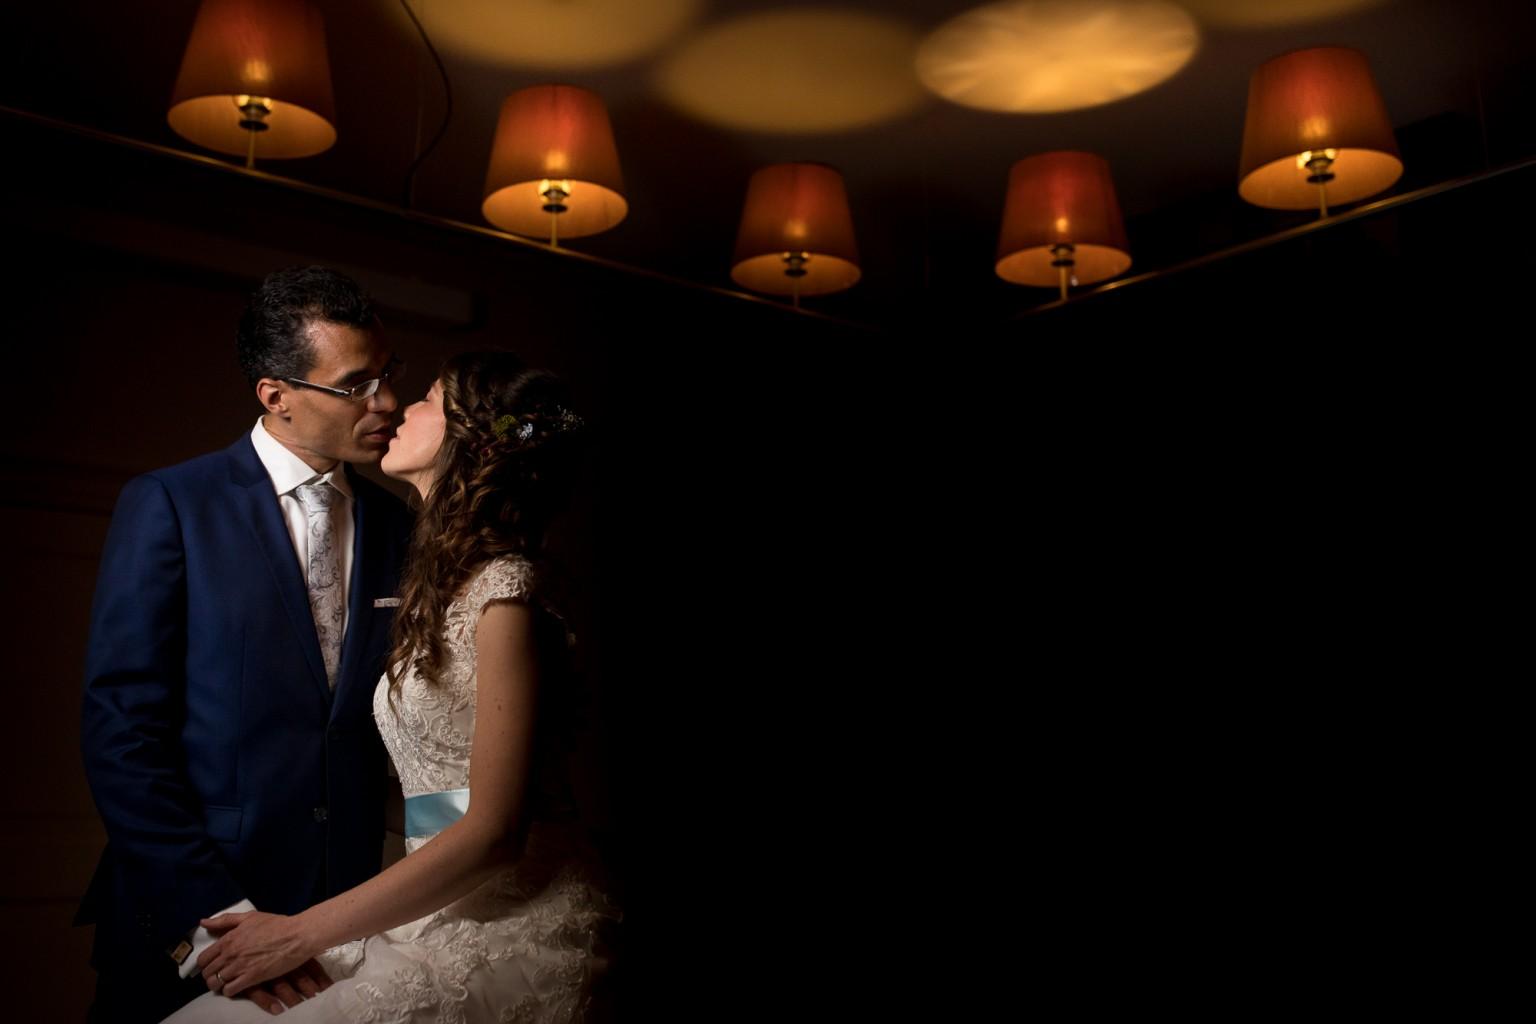 Off camera flash avondopname bruidspaar